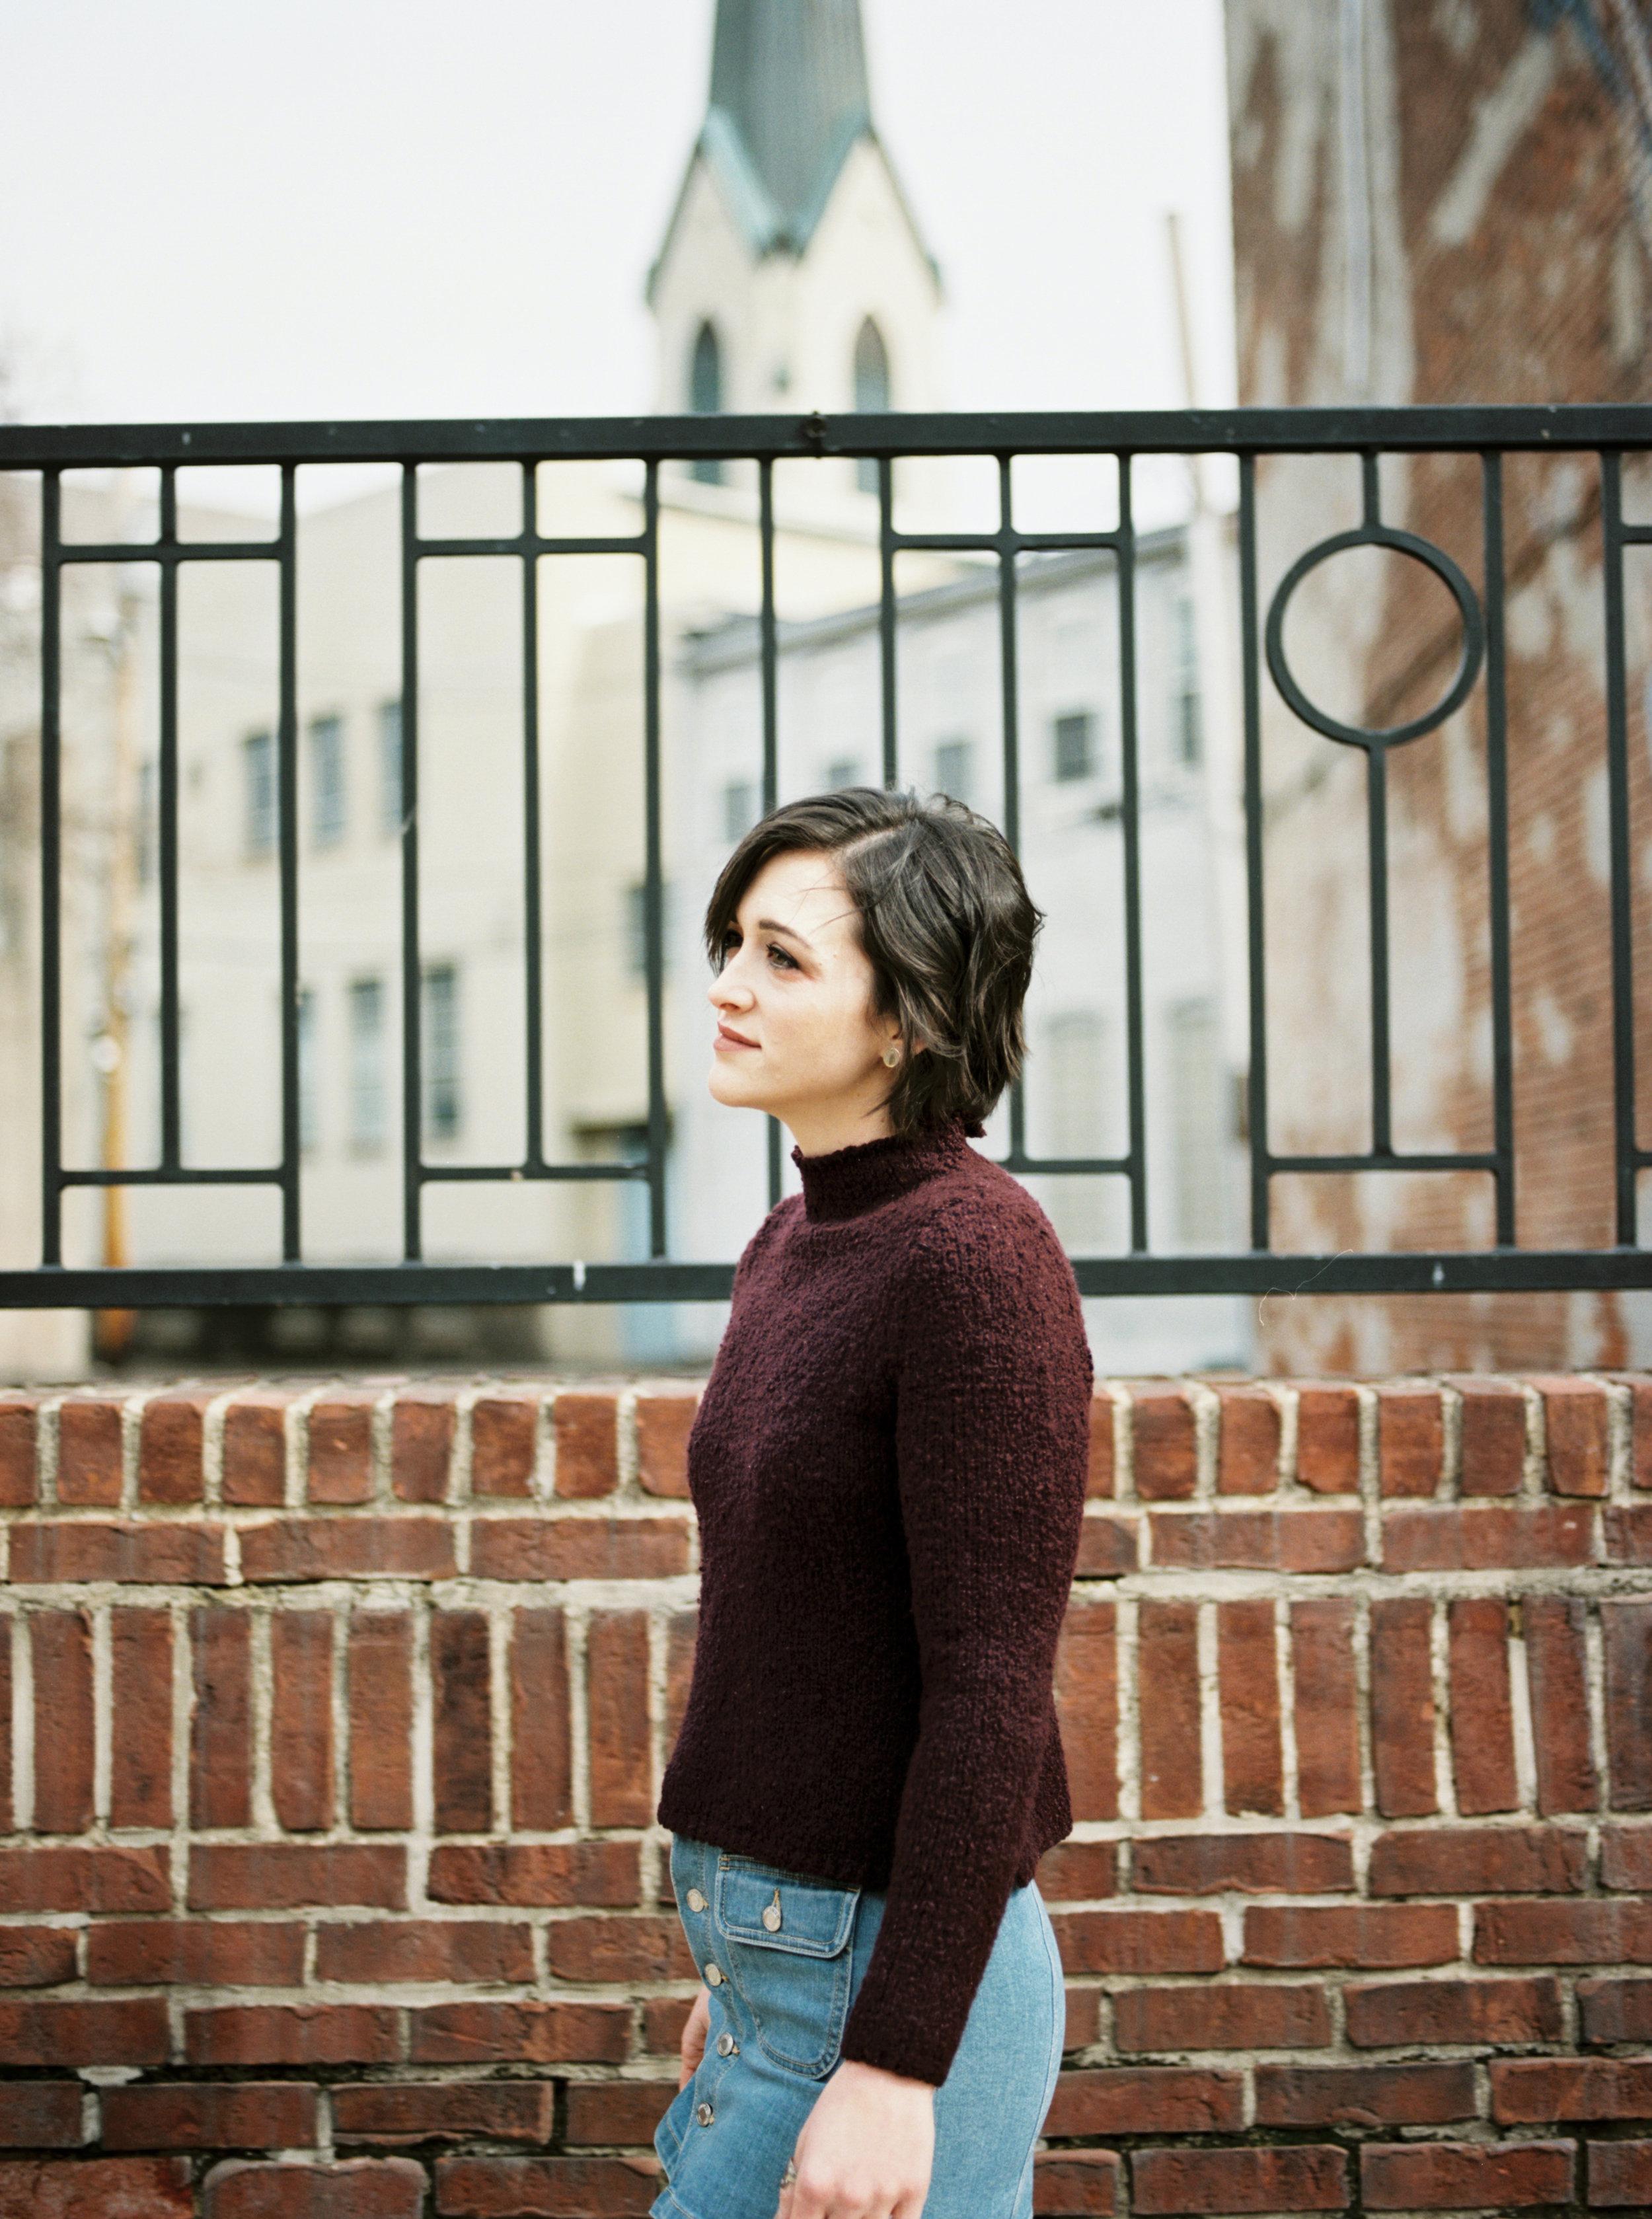 Dayton_Ohio_Cincinnati_Columbus_Cleveland_Film_Portrait_Photographer_Tonya_Espy-11.jpg